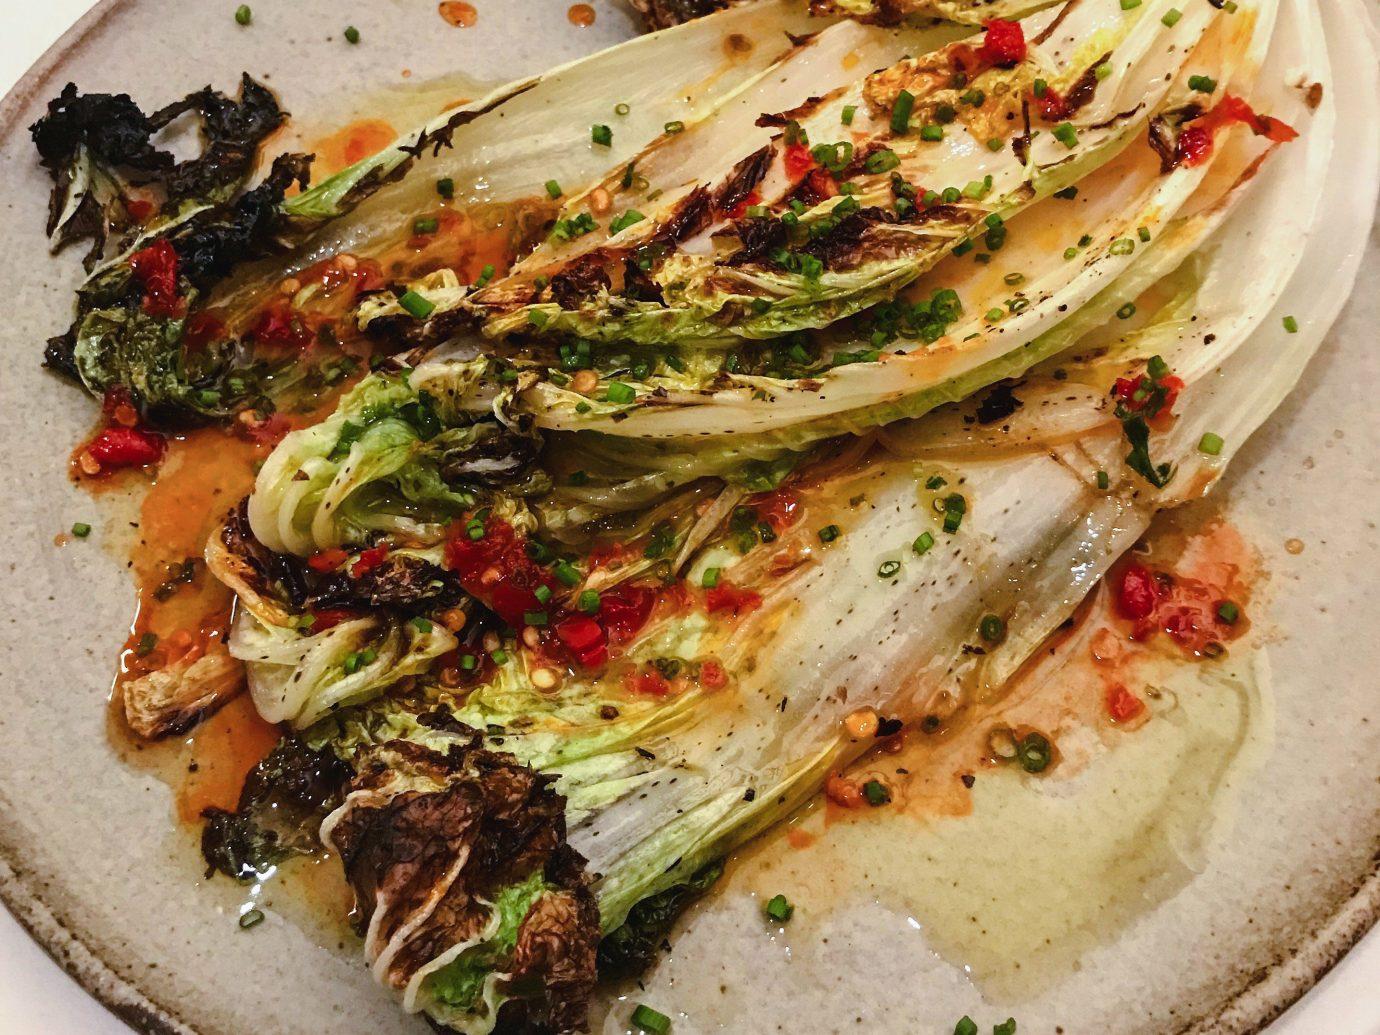 Food + Drink plate food dish Seafood vegetarian food vegetable recipe leaf vegetable fish meat